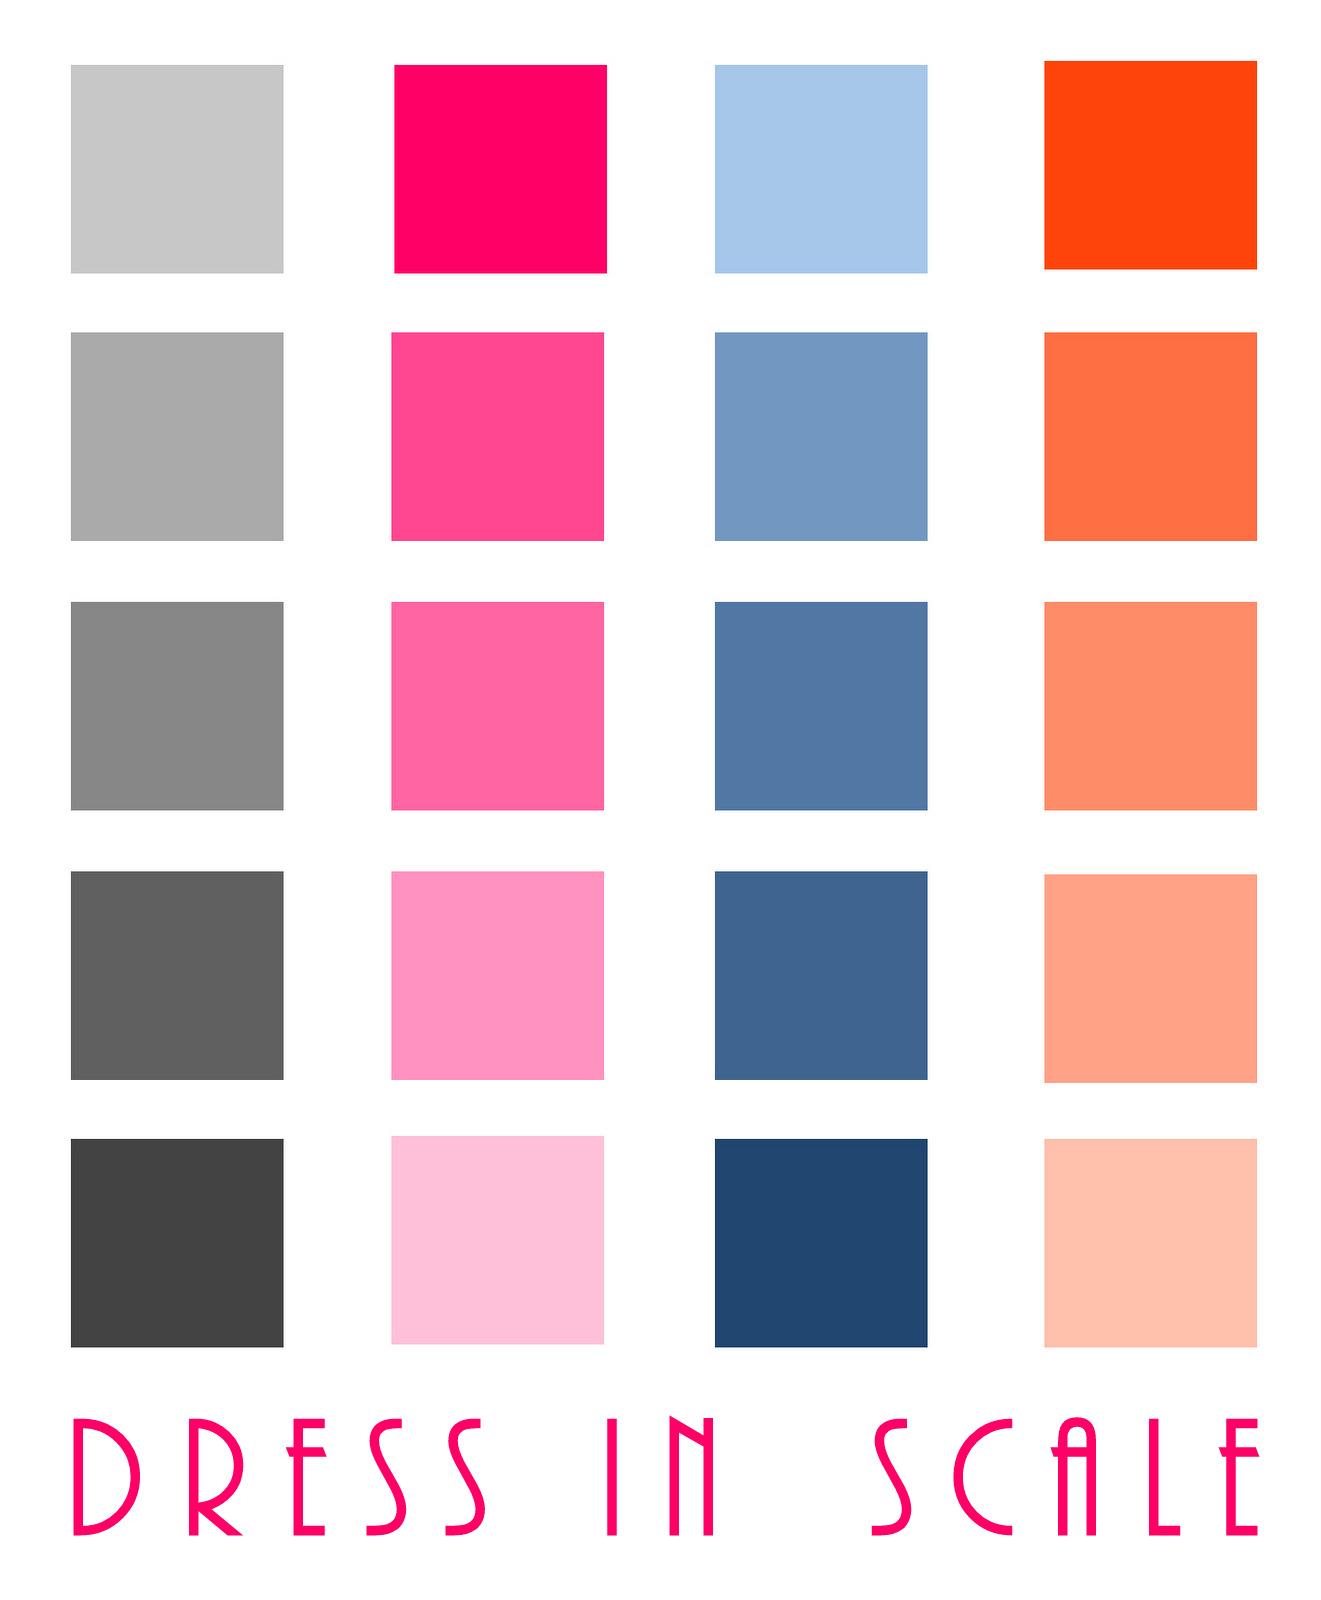 dress in scale